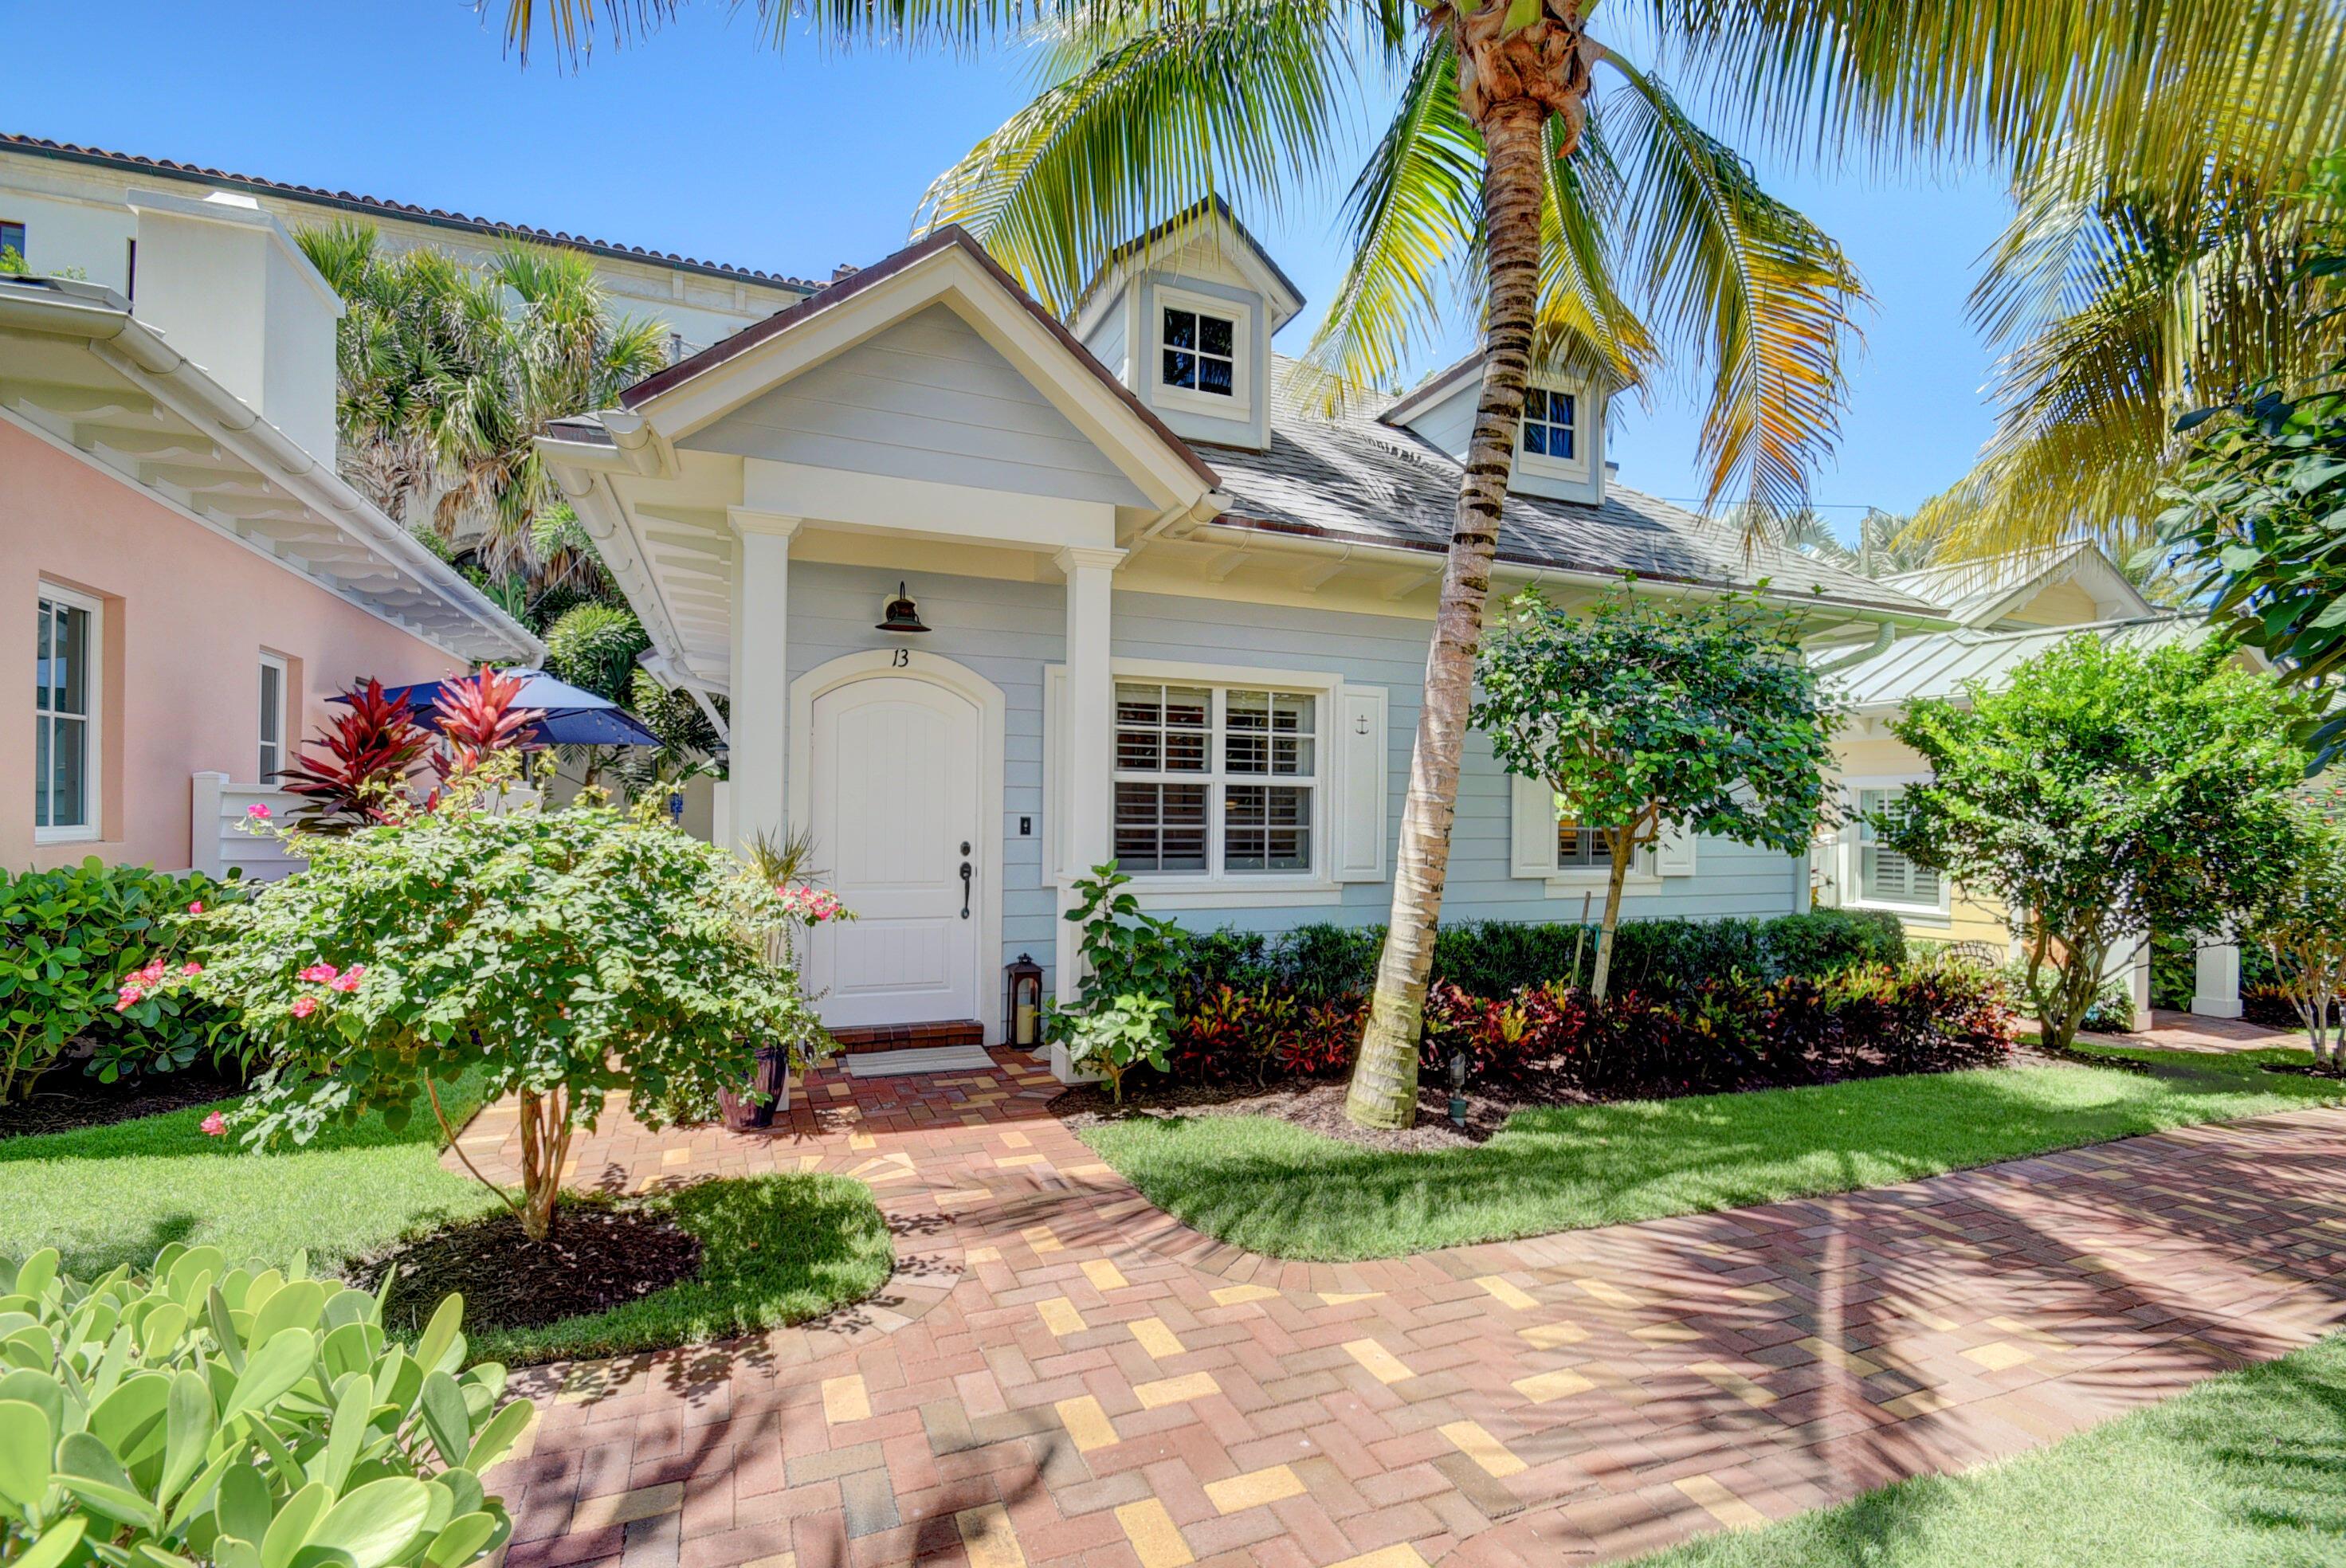 2225 S Ocean Boulevard 13 For Sale 10746707, FL